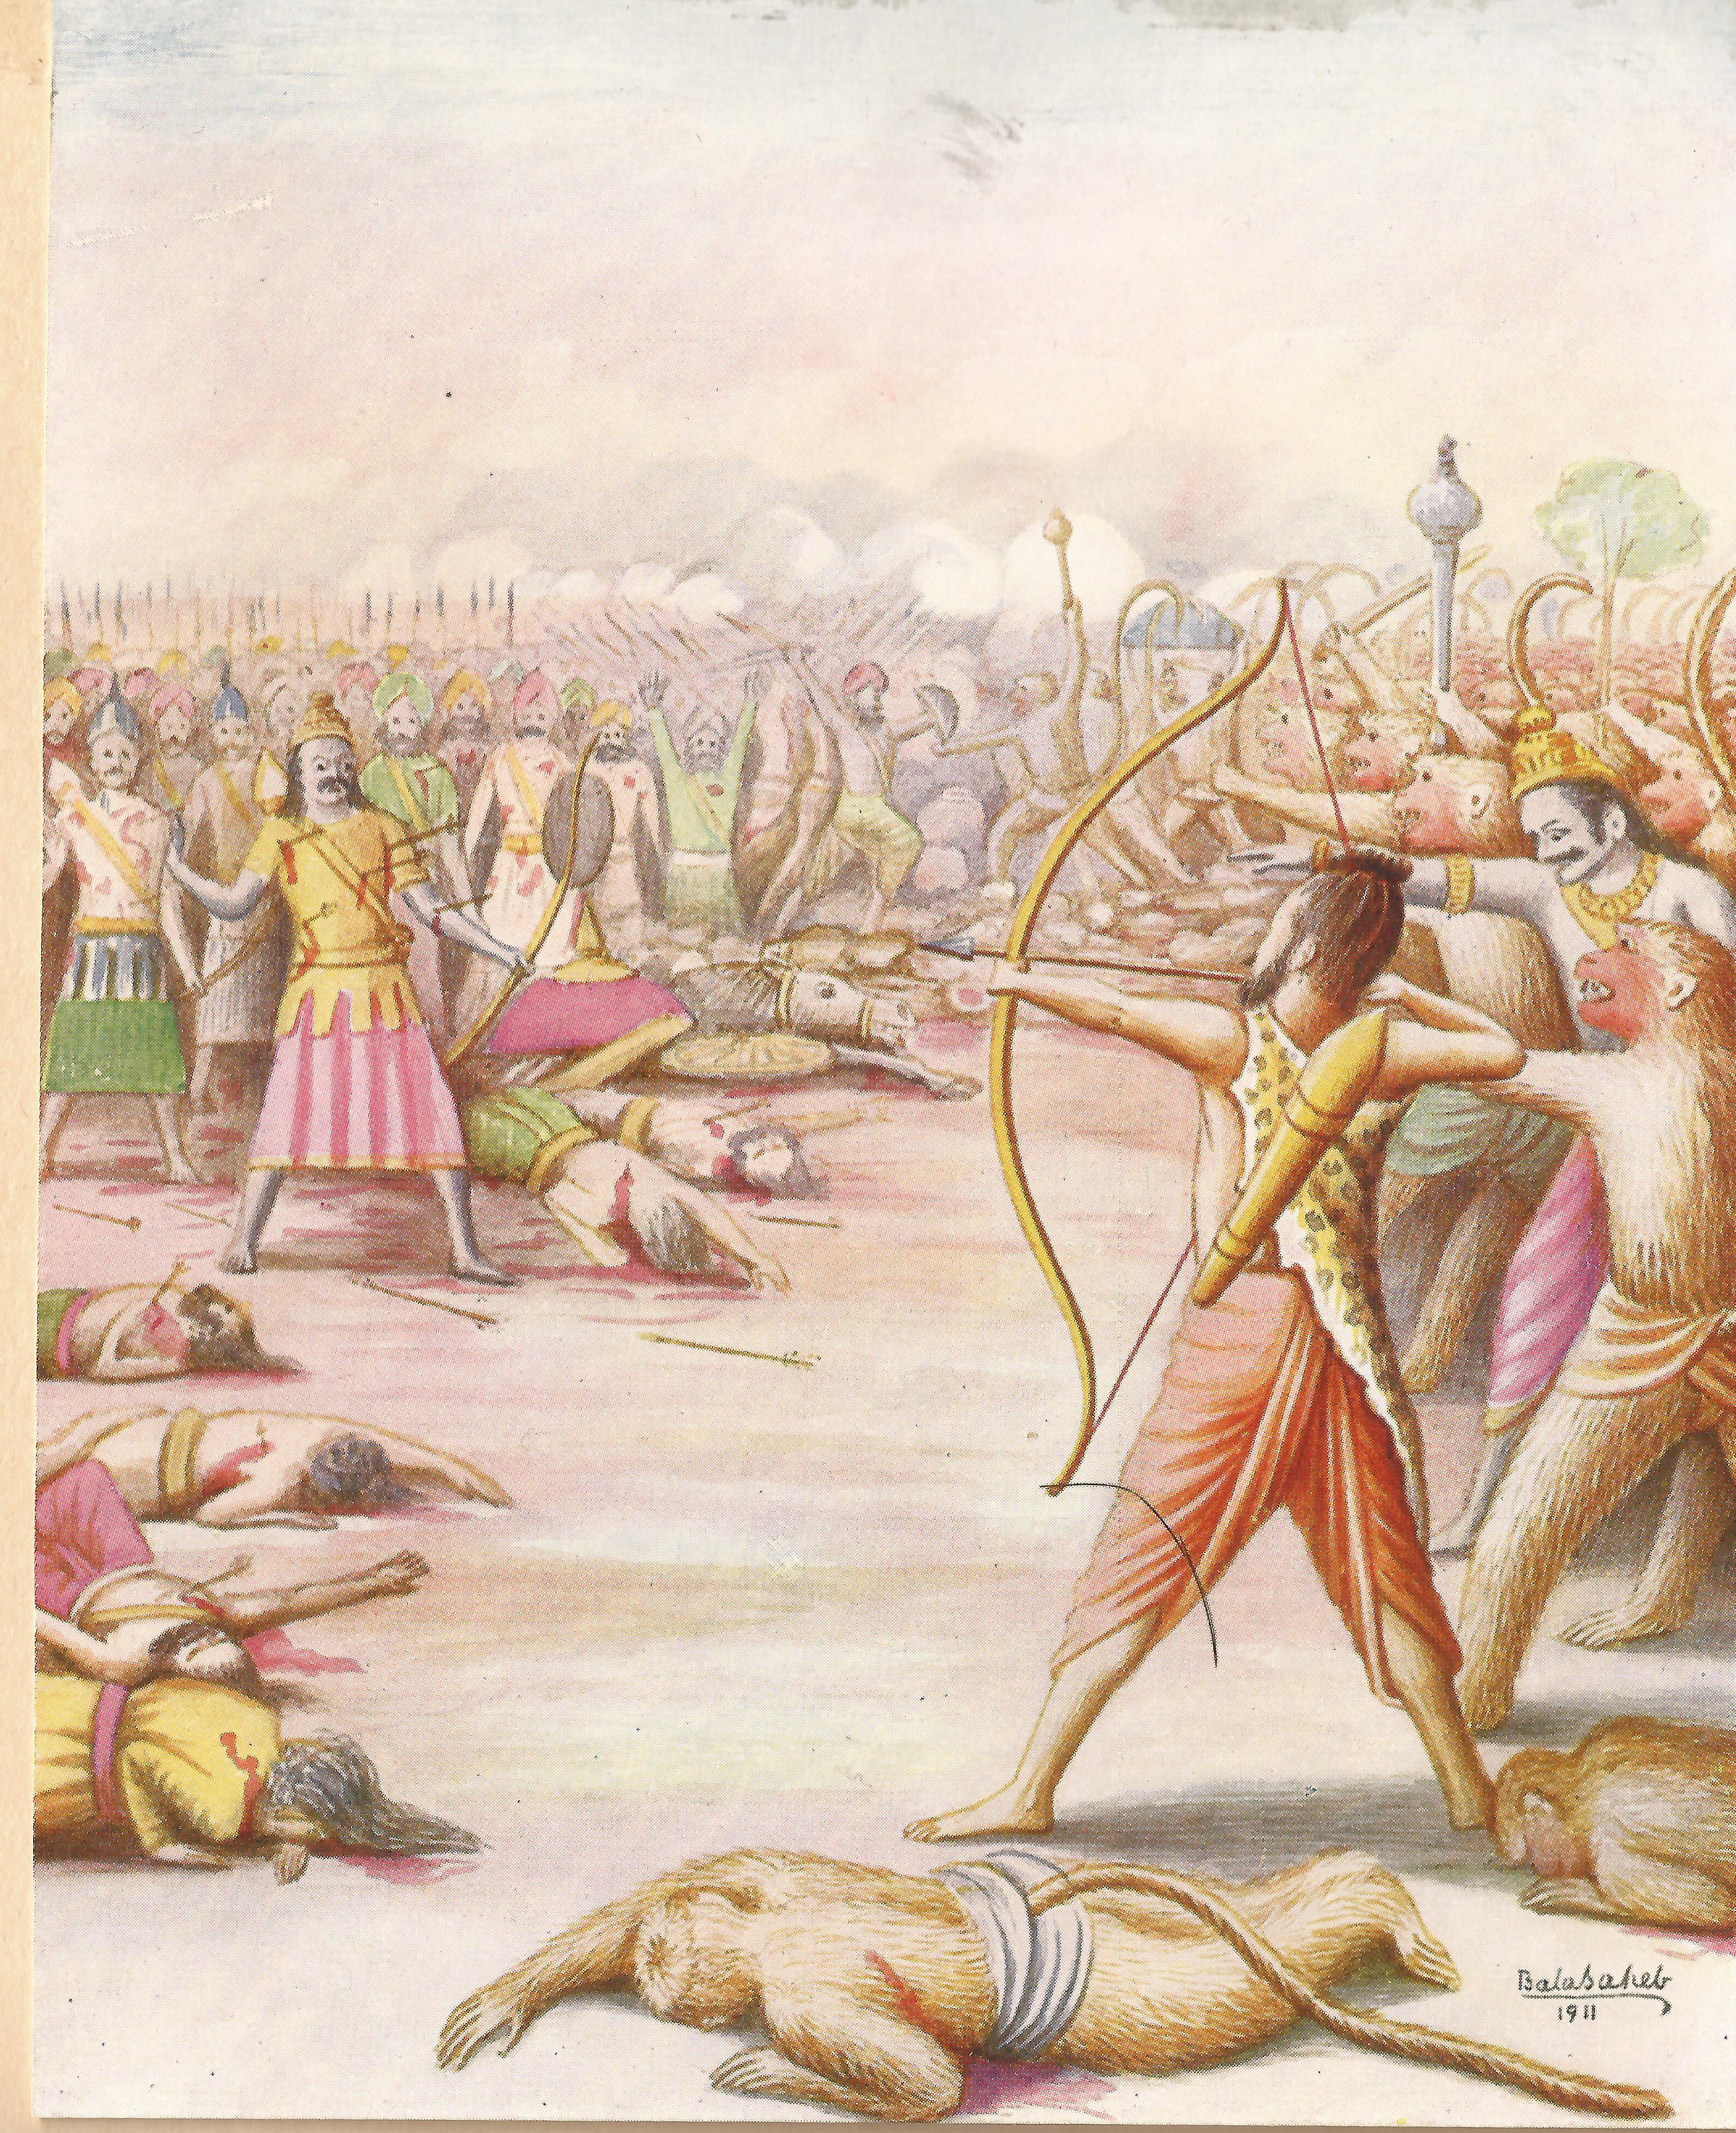 https://upload.wikimedia.org/wikipedia/commons/6/64/Killing_of_Indrajit_Painting_by_Balasaheb_Pant_Pratinidhi.jpg